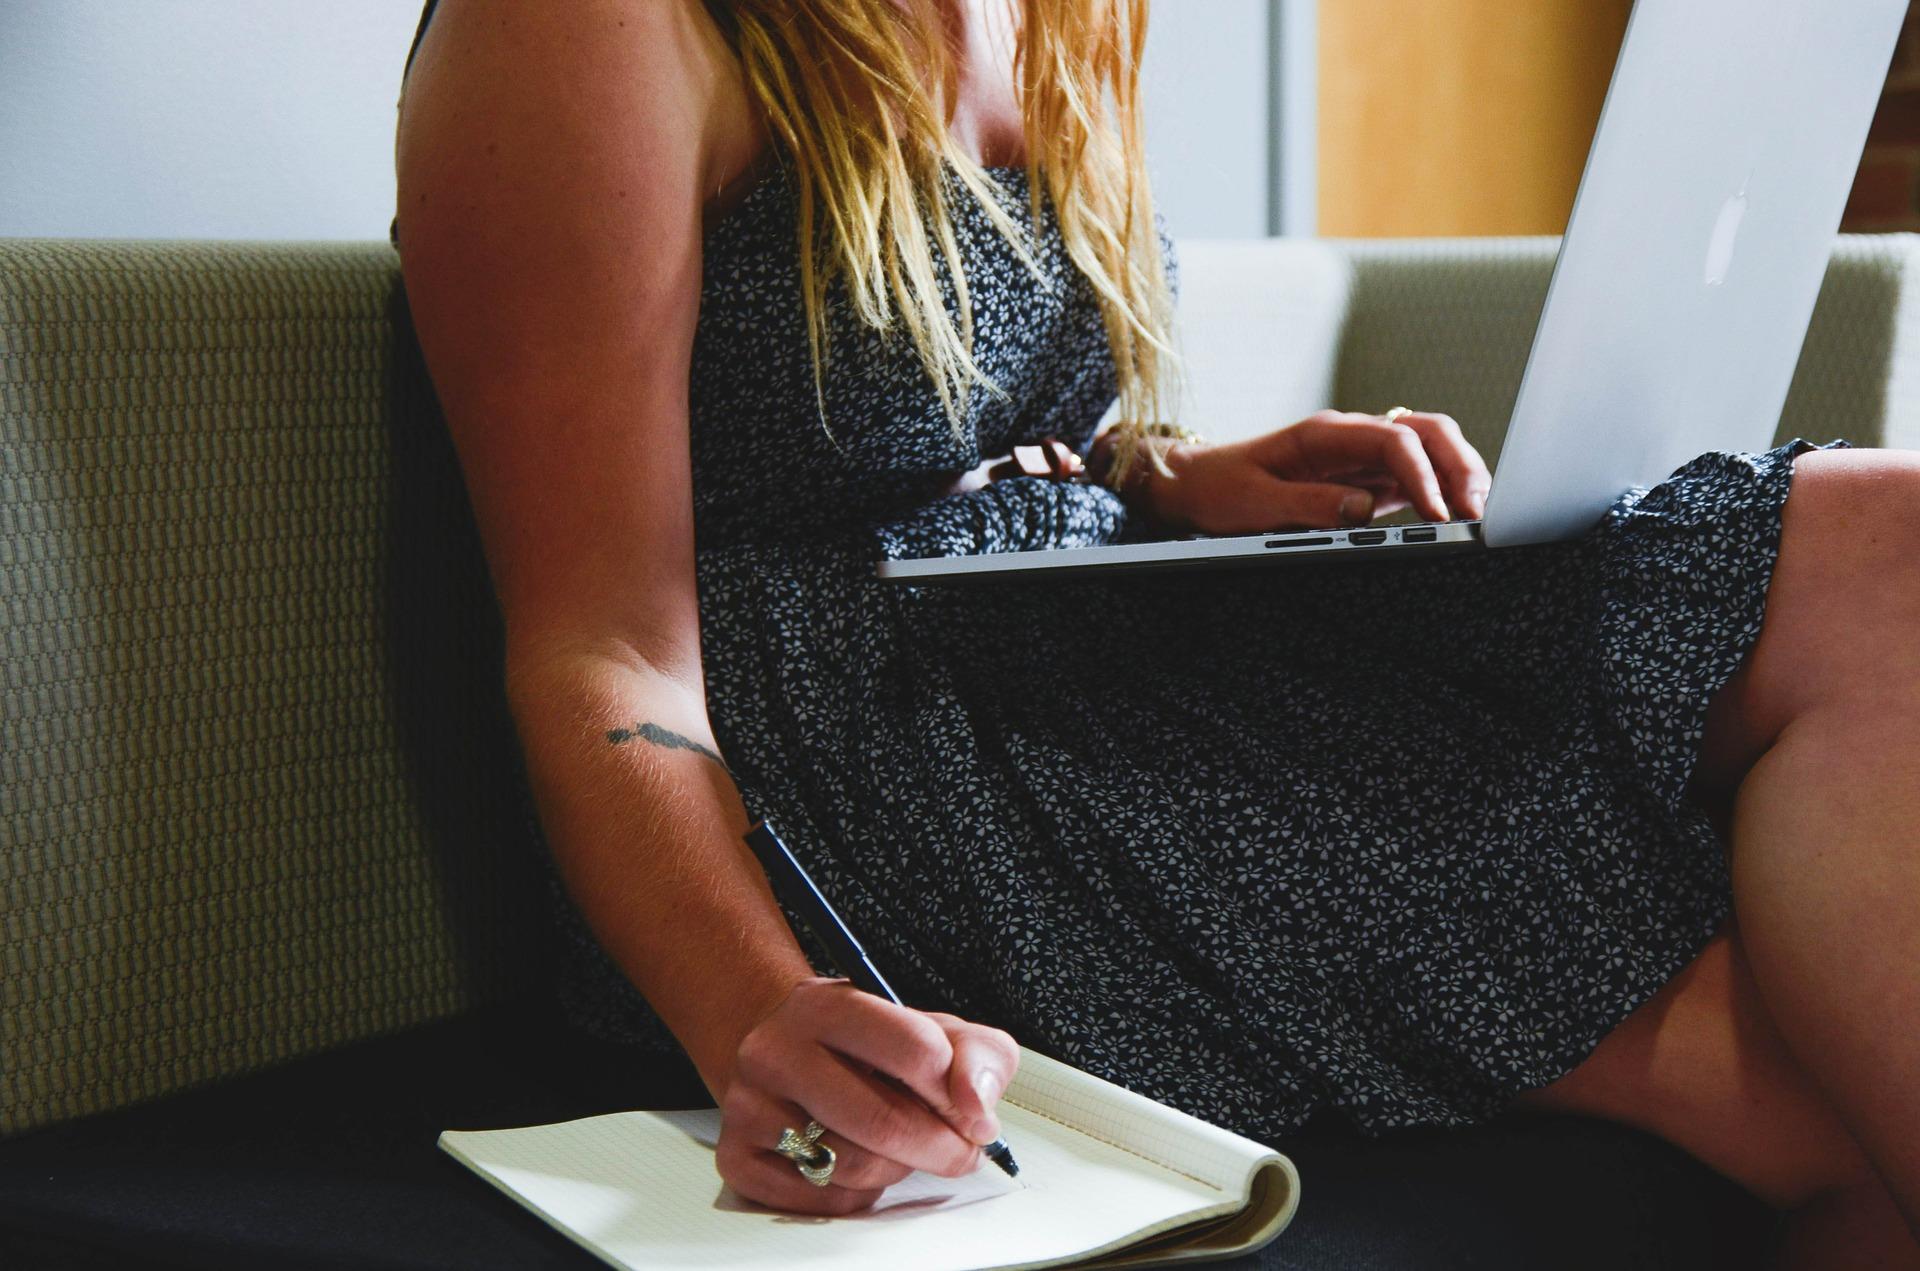 work, working woman, health problems